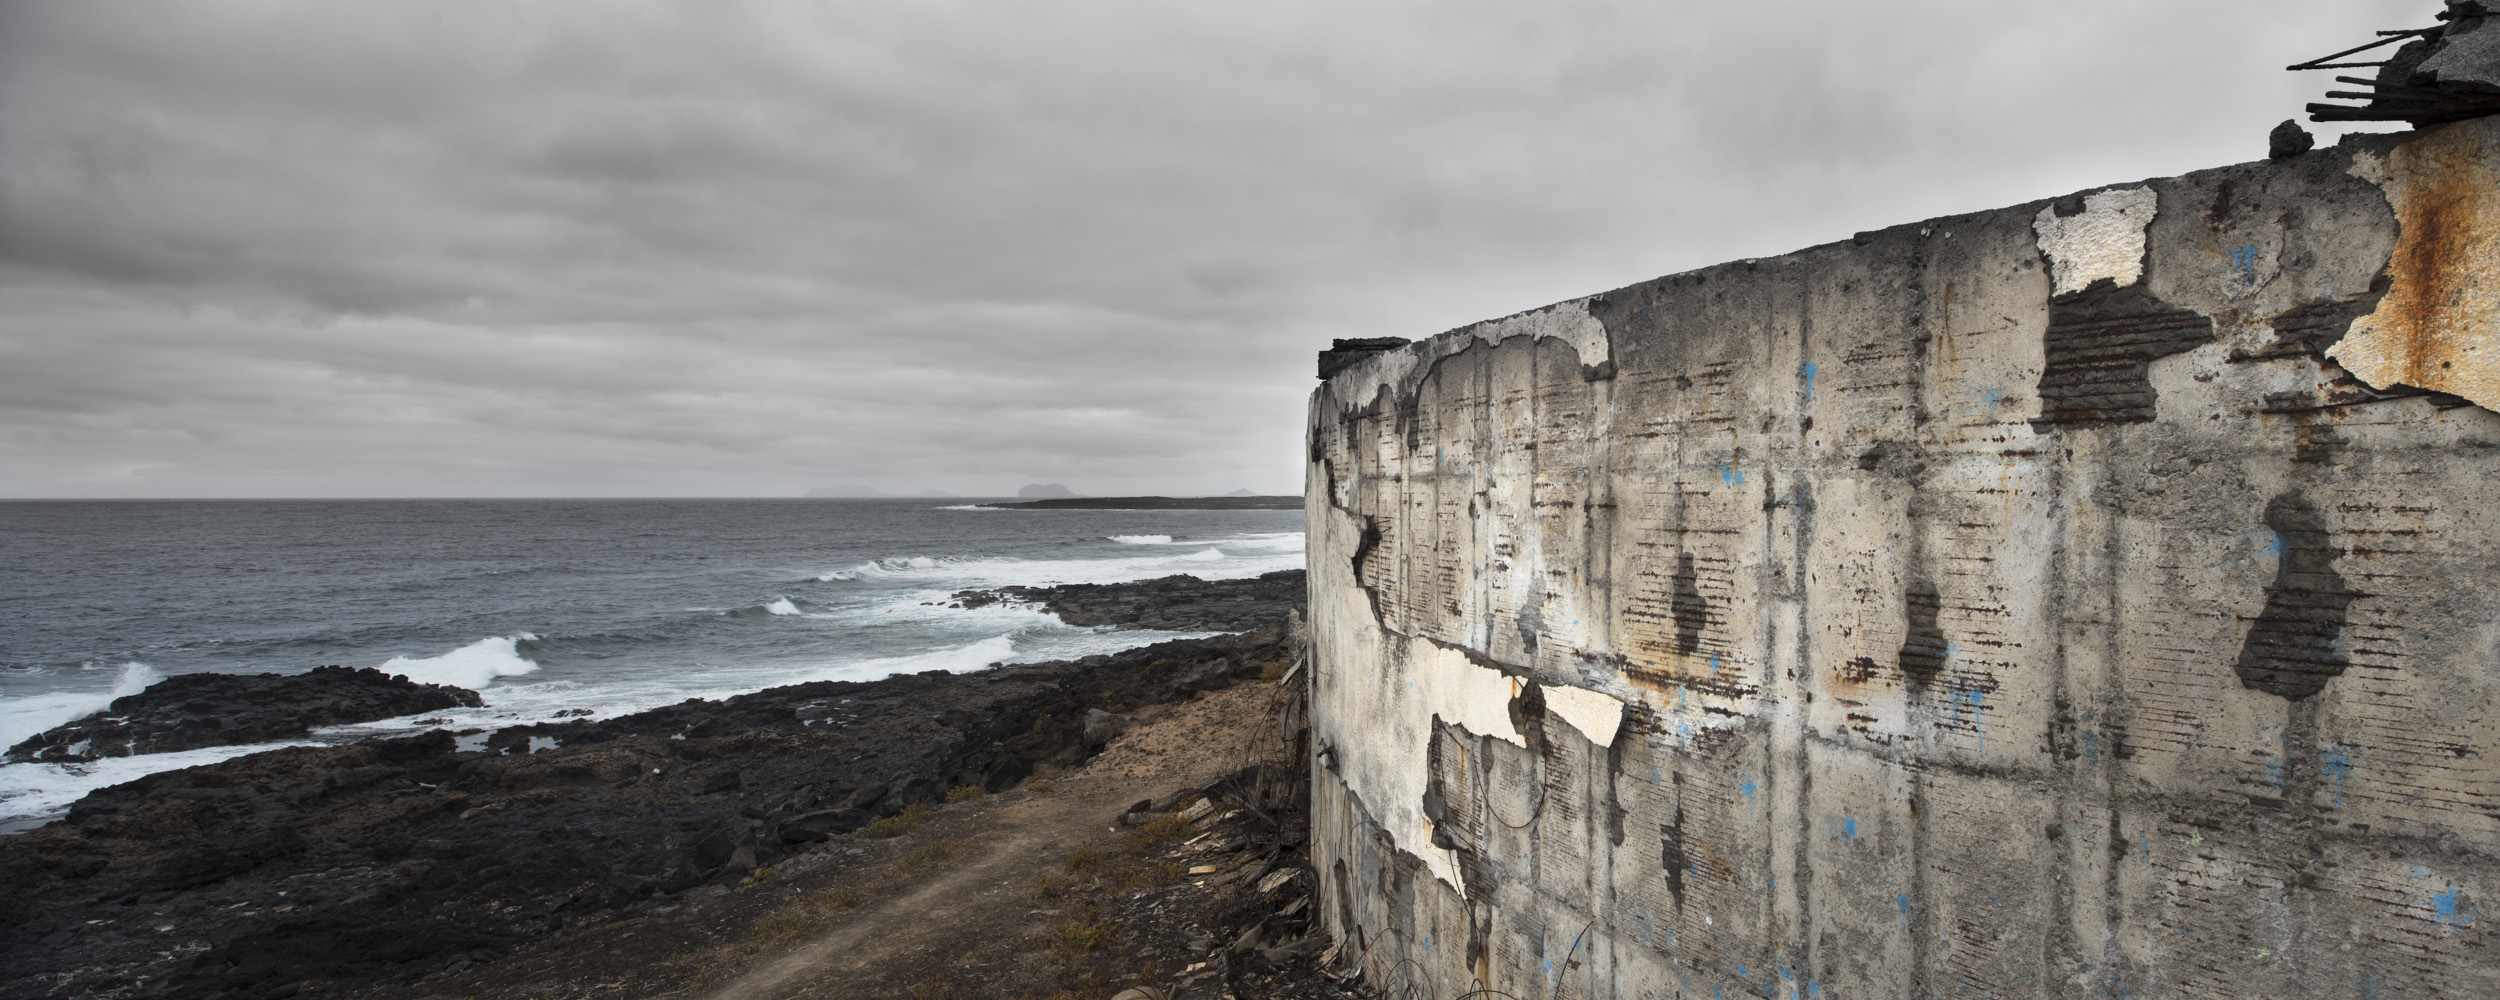 salt traces - THE ISLAND OF THE HORIZON - cesar azcarate, fotografia